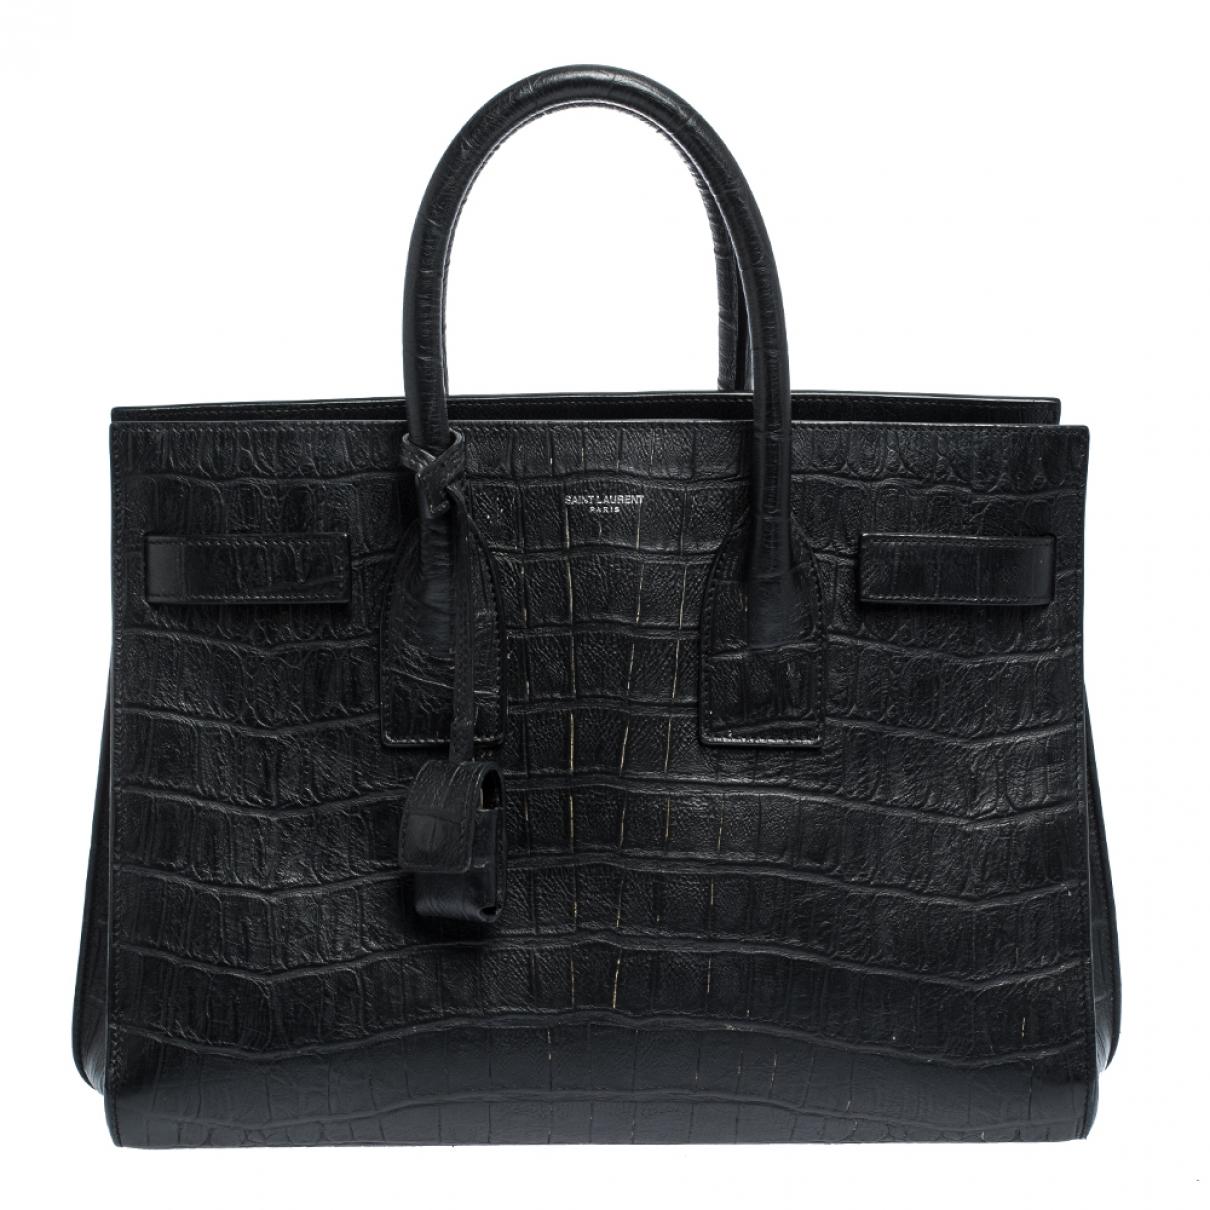 Saint Laurent Sac de Jour Beige Leather handbag for Women \N